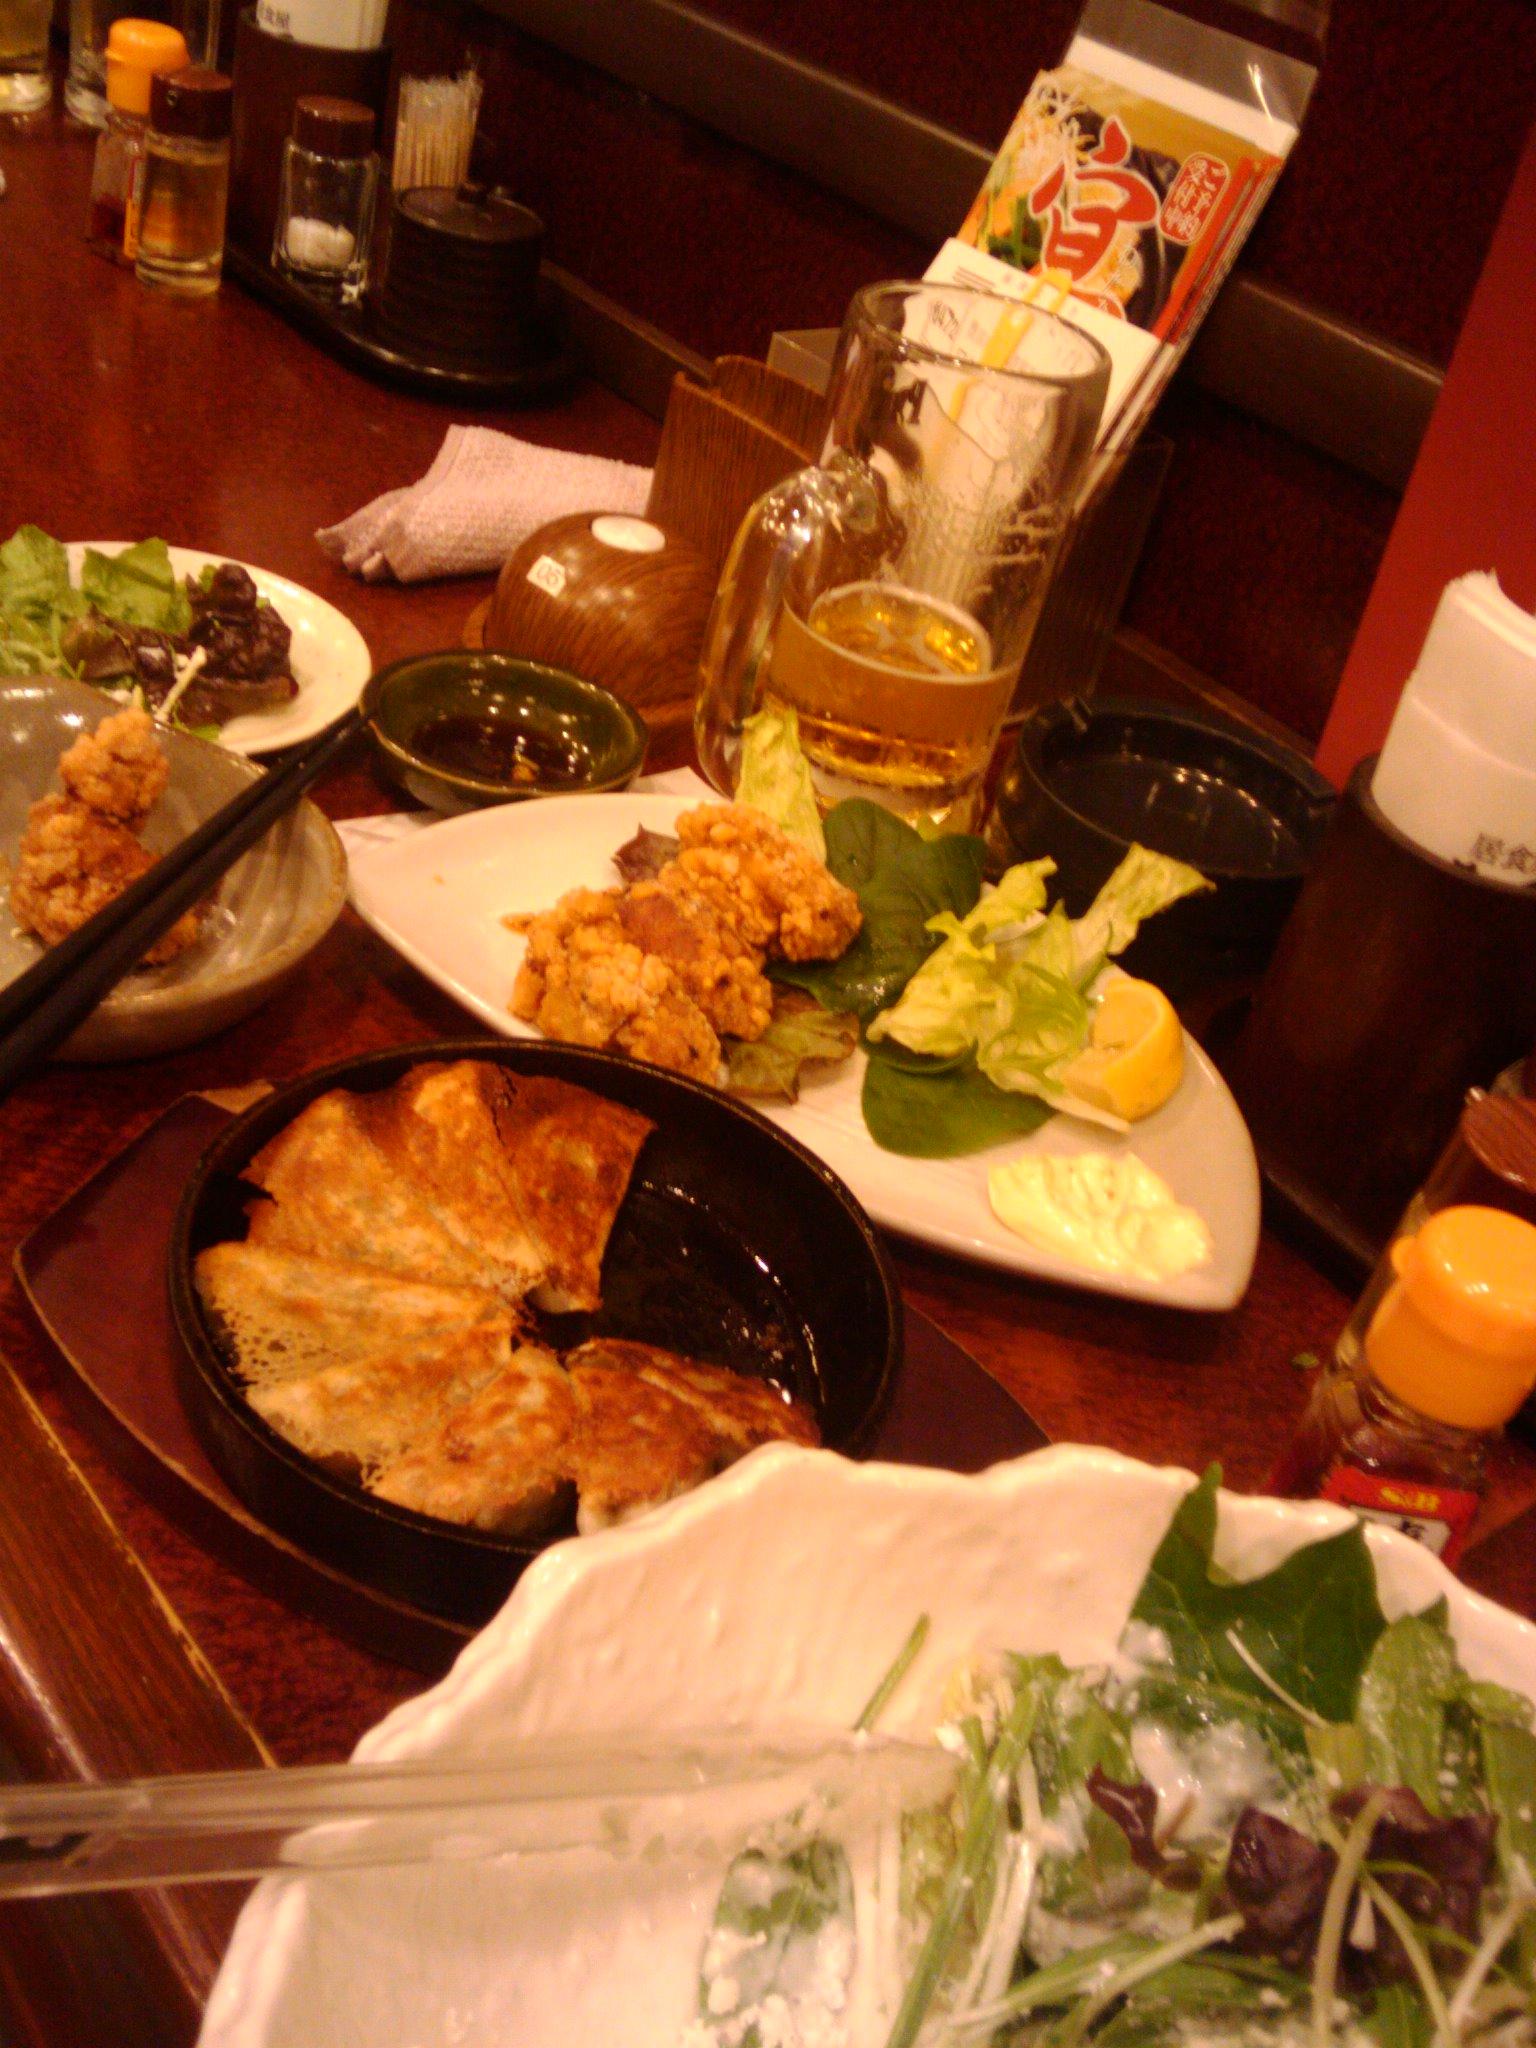 obligatoryfood